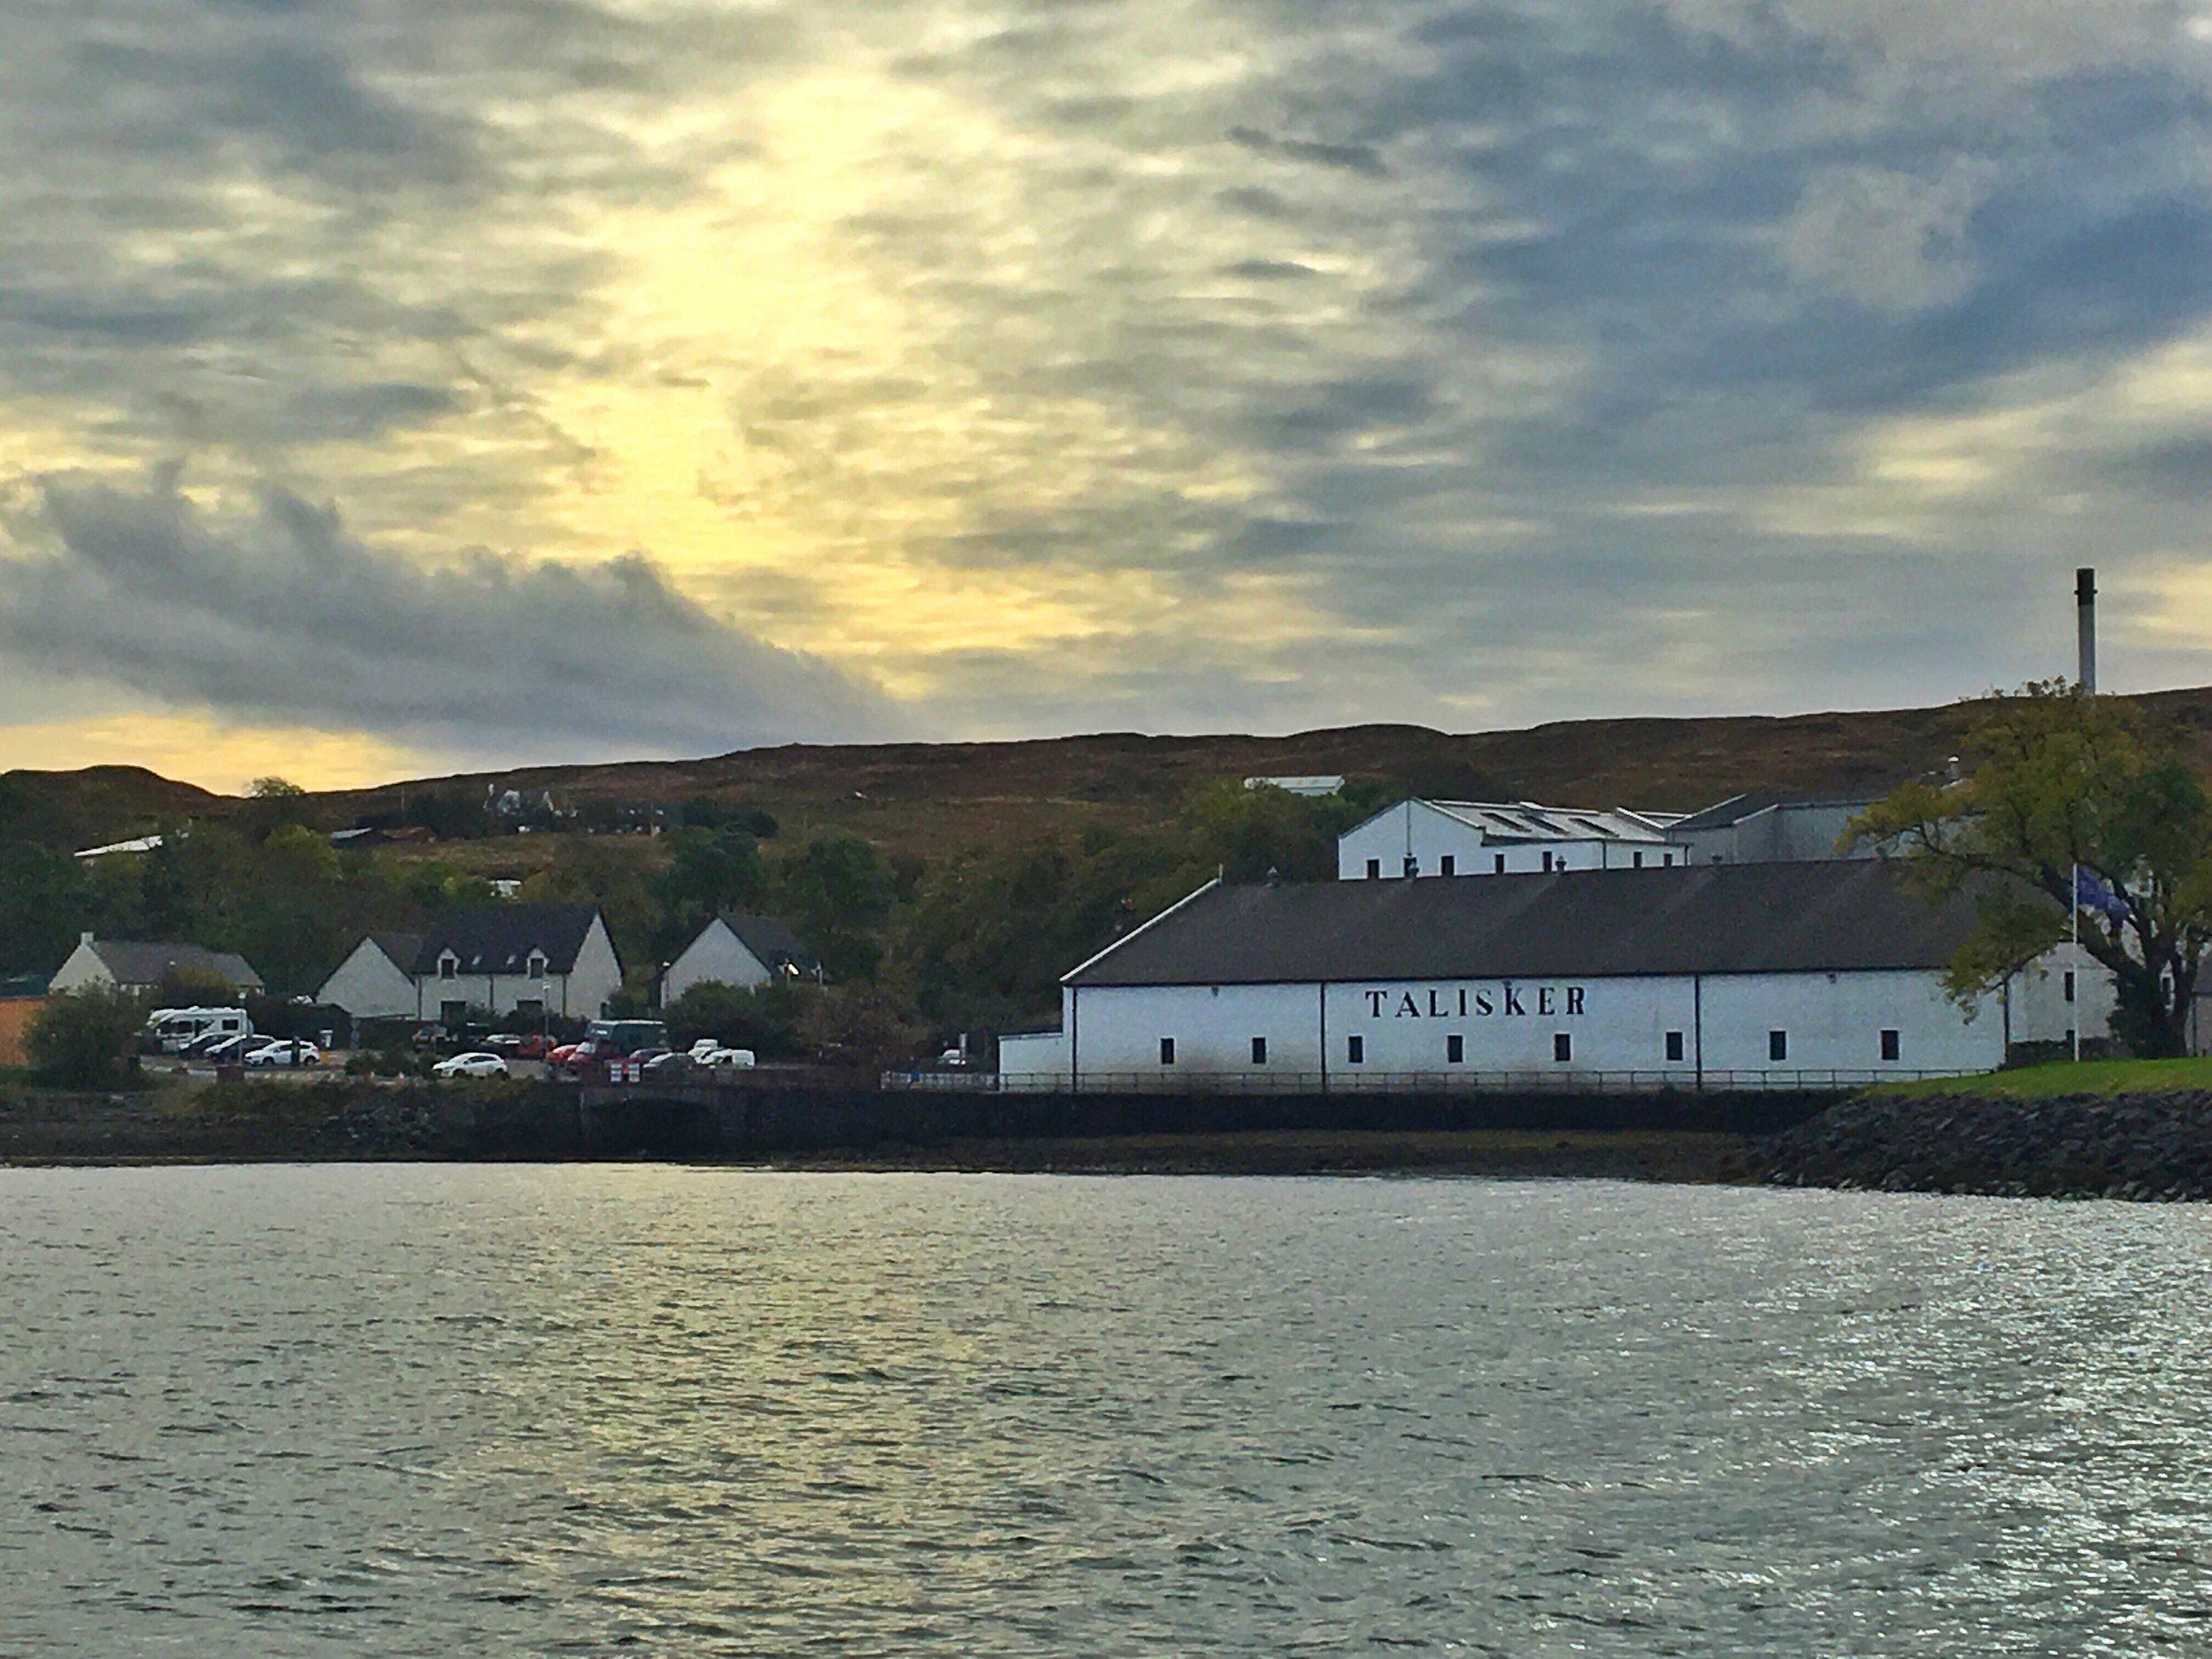 Talkisker, Scotland